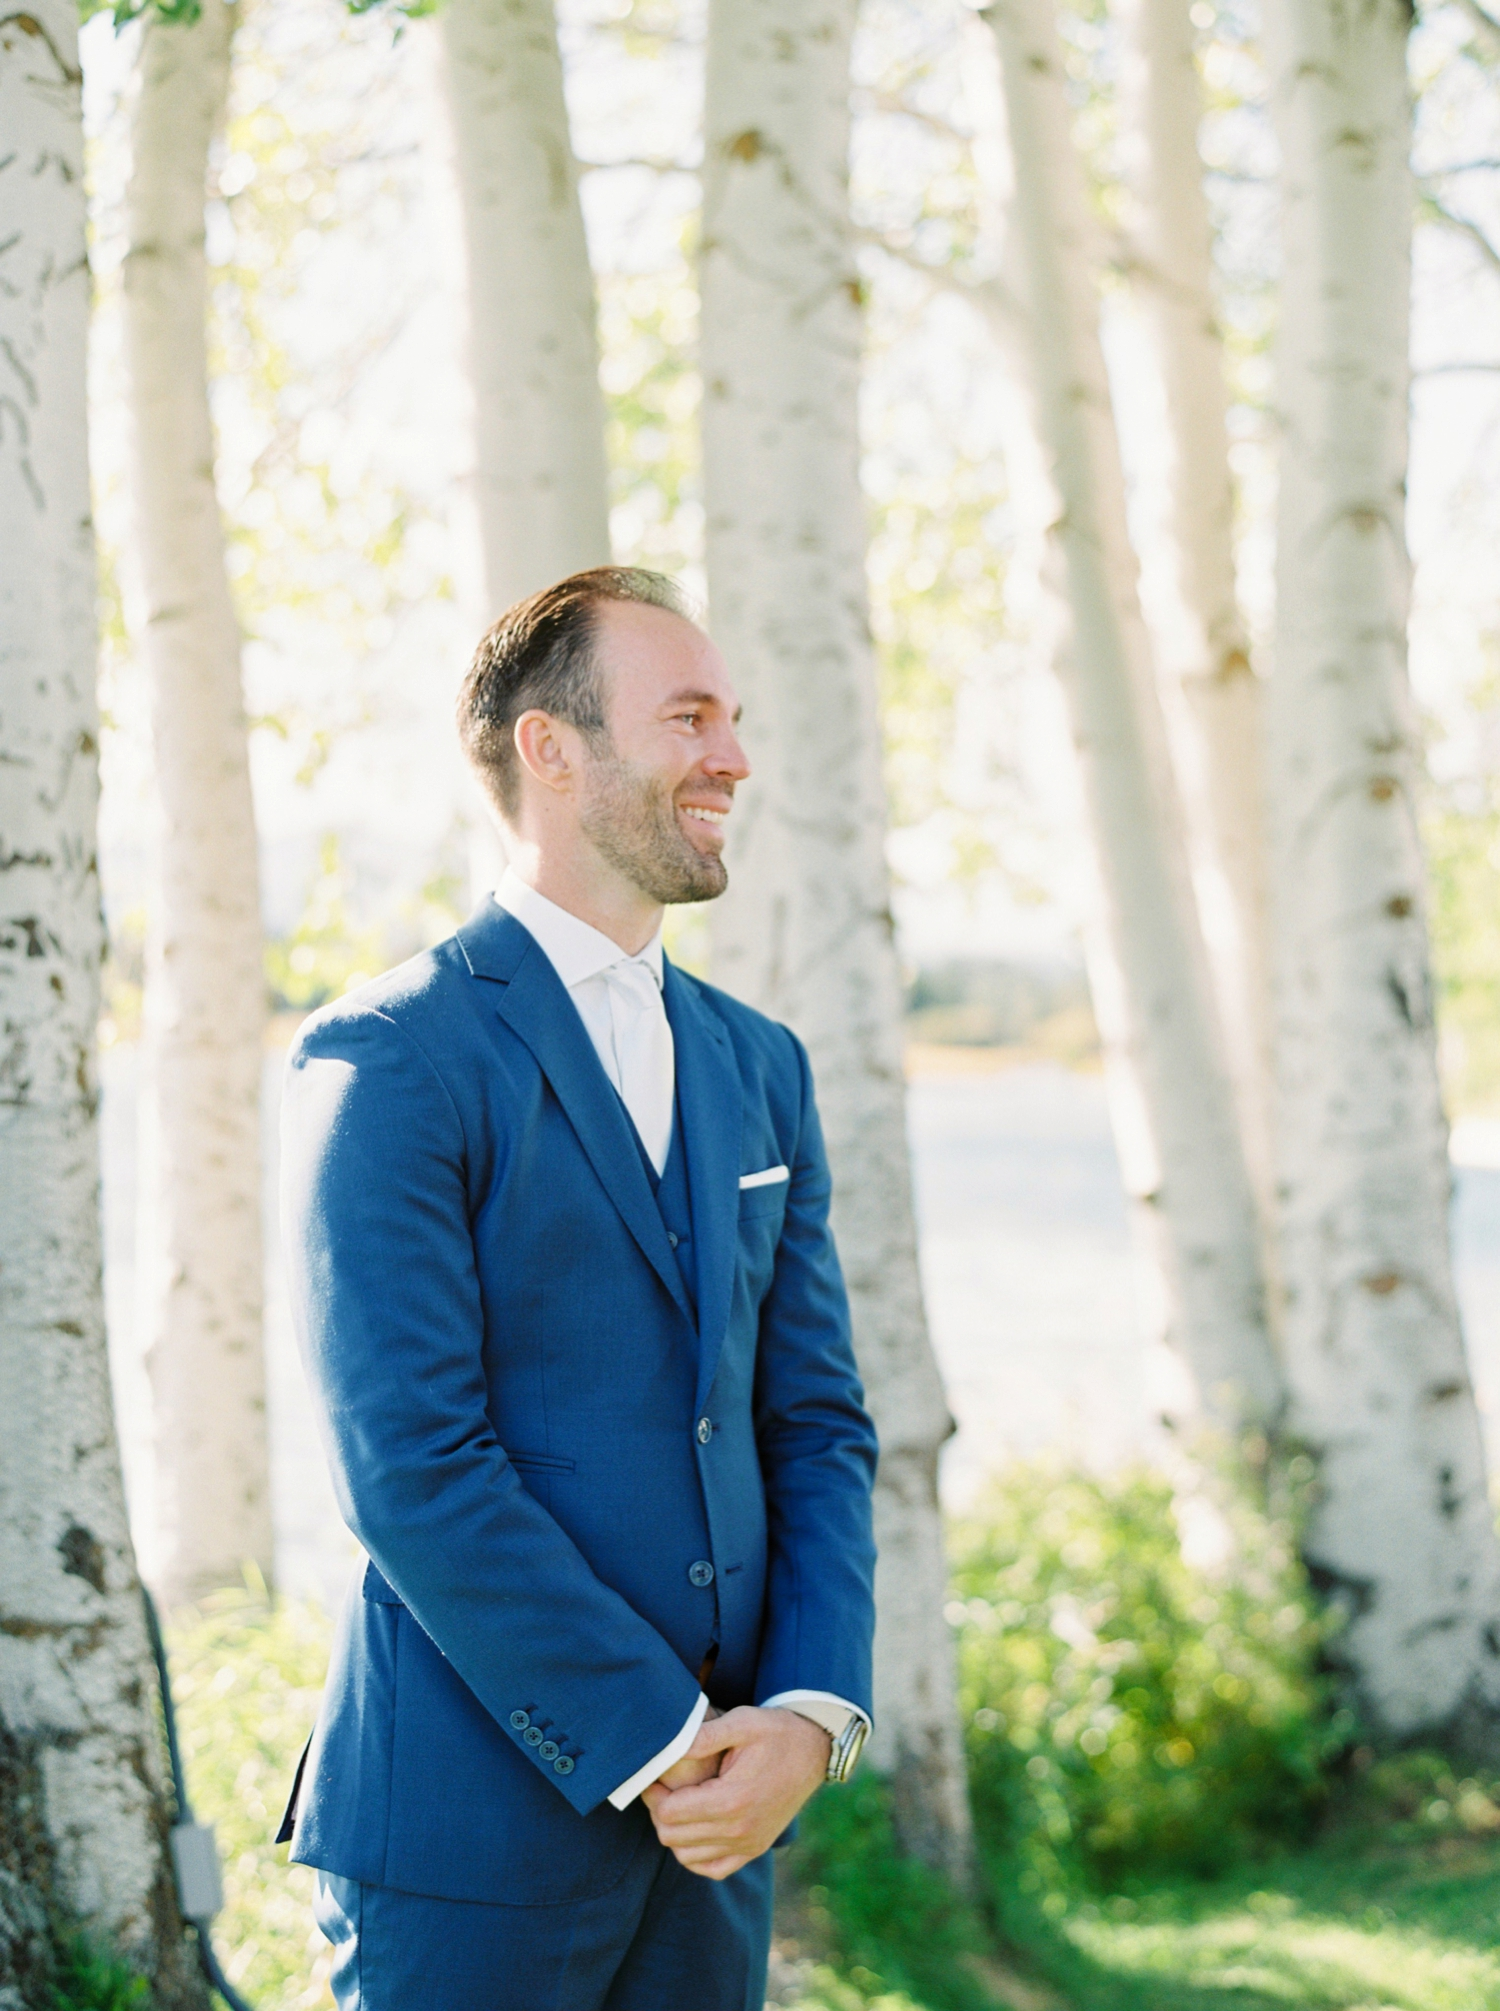 Calgary wedding photographers | oregon wedding photographers | fine art film | Justine Milton Photography | oregon wedding | wedding ceremony | grooms reaction